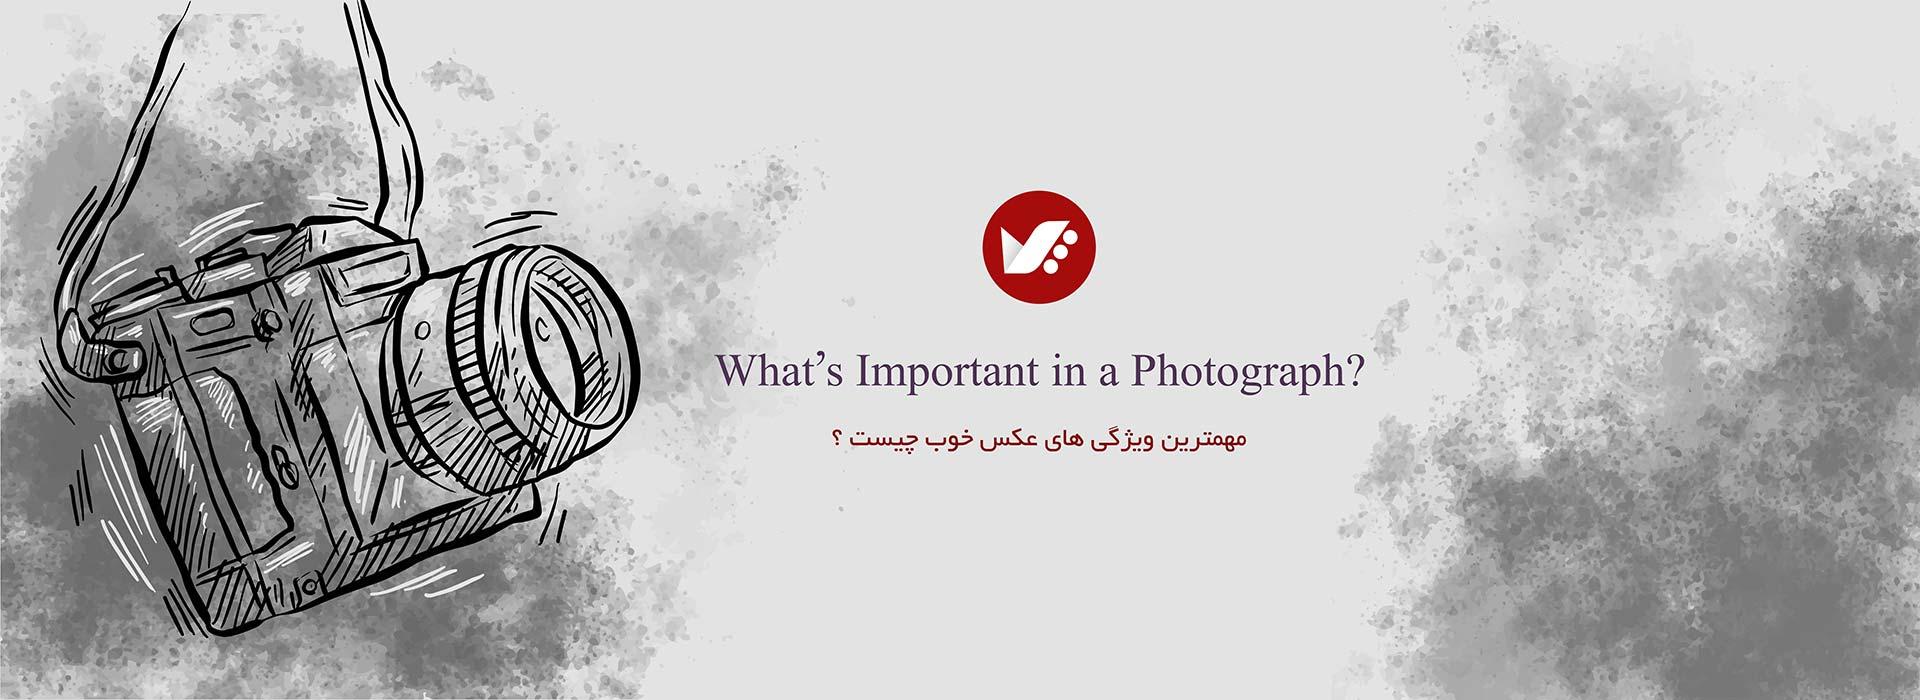 photograph banner - مهمترین ویژگی های عکس خوب چیست ؟